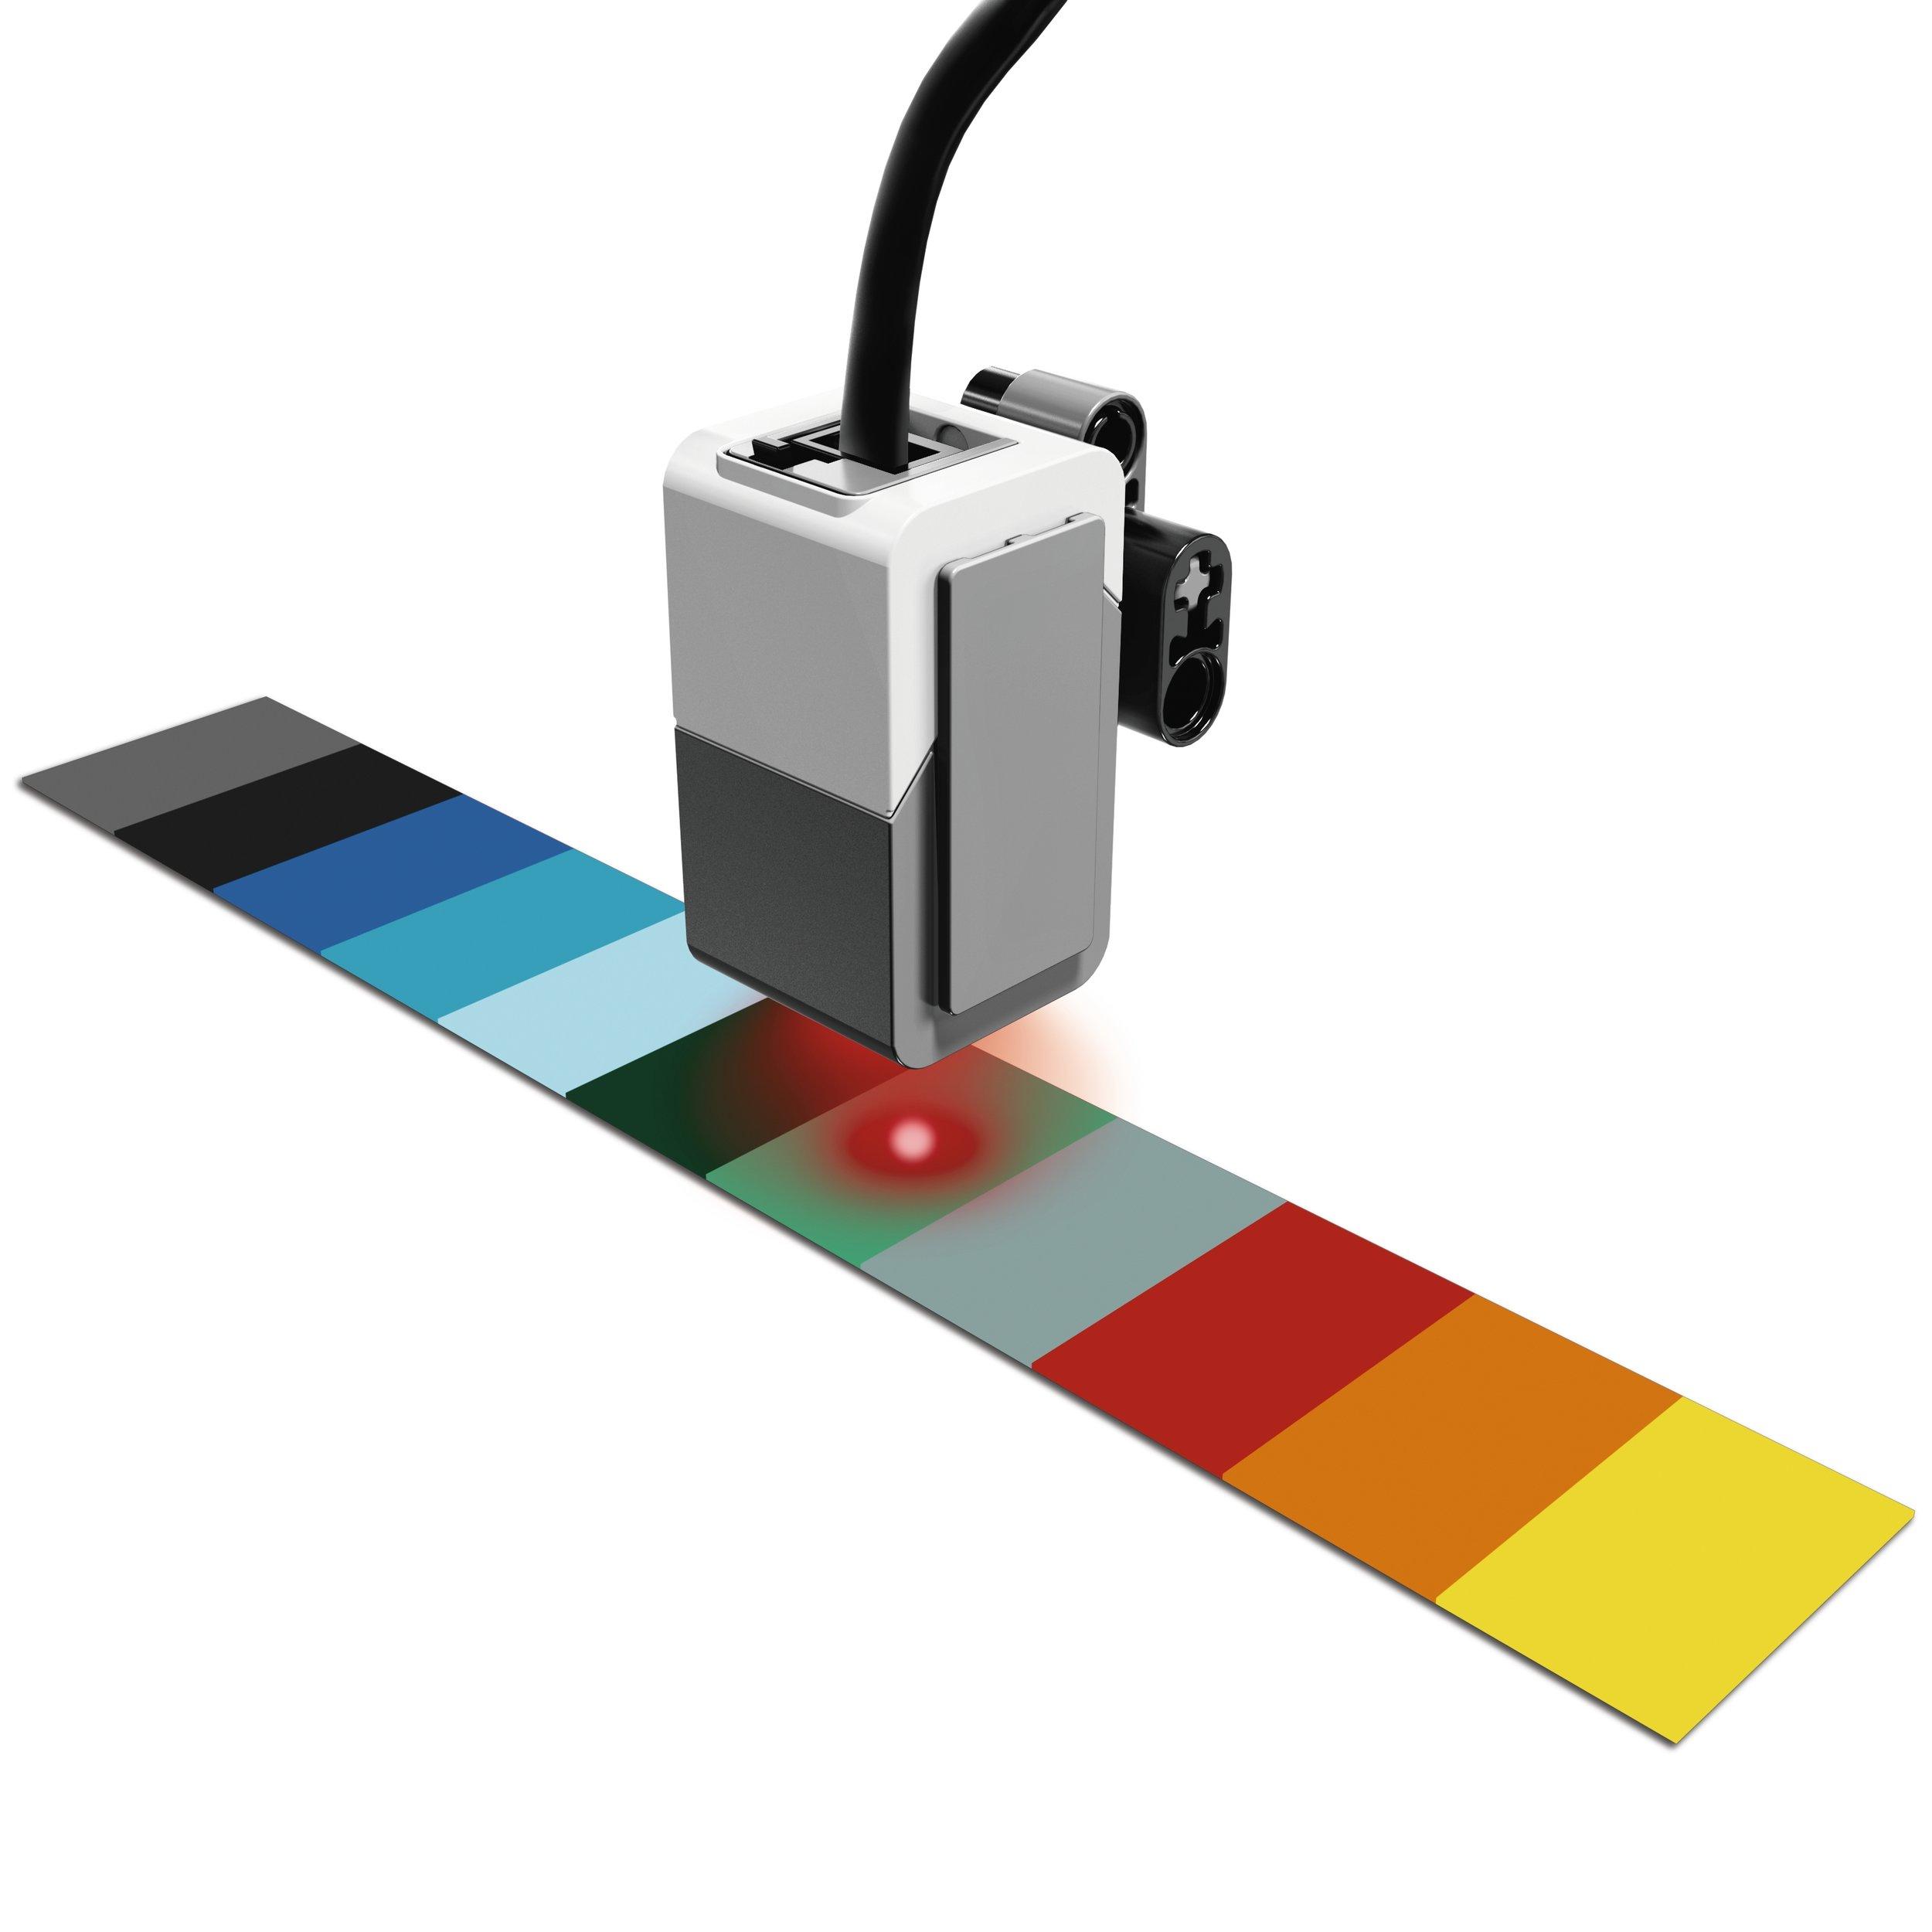 45506_prod_color sensor_color.JPG